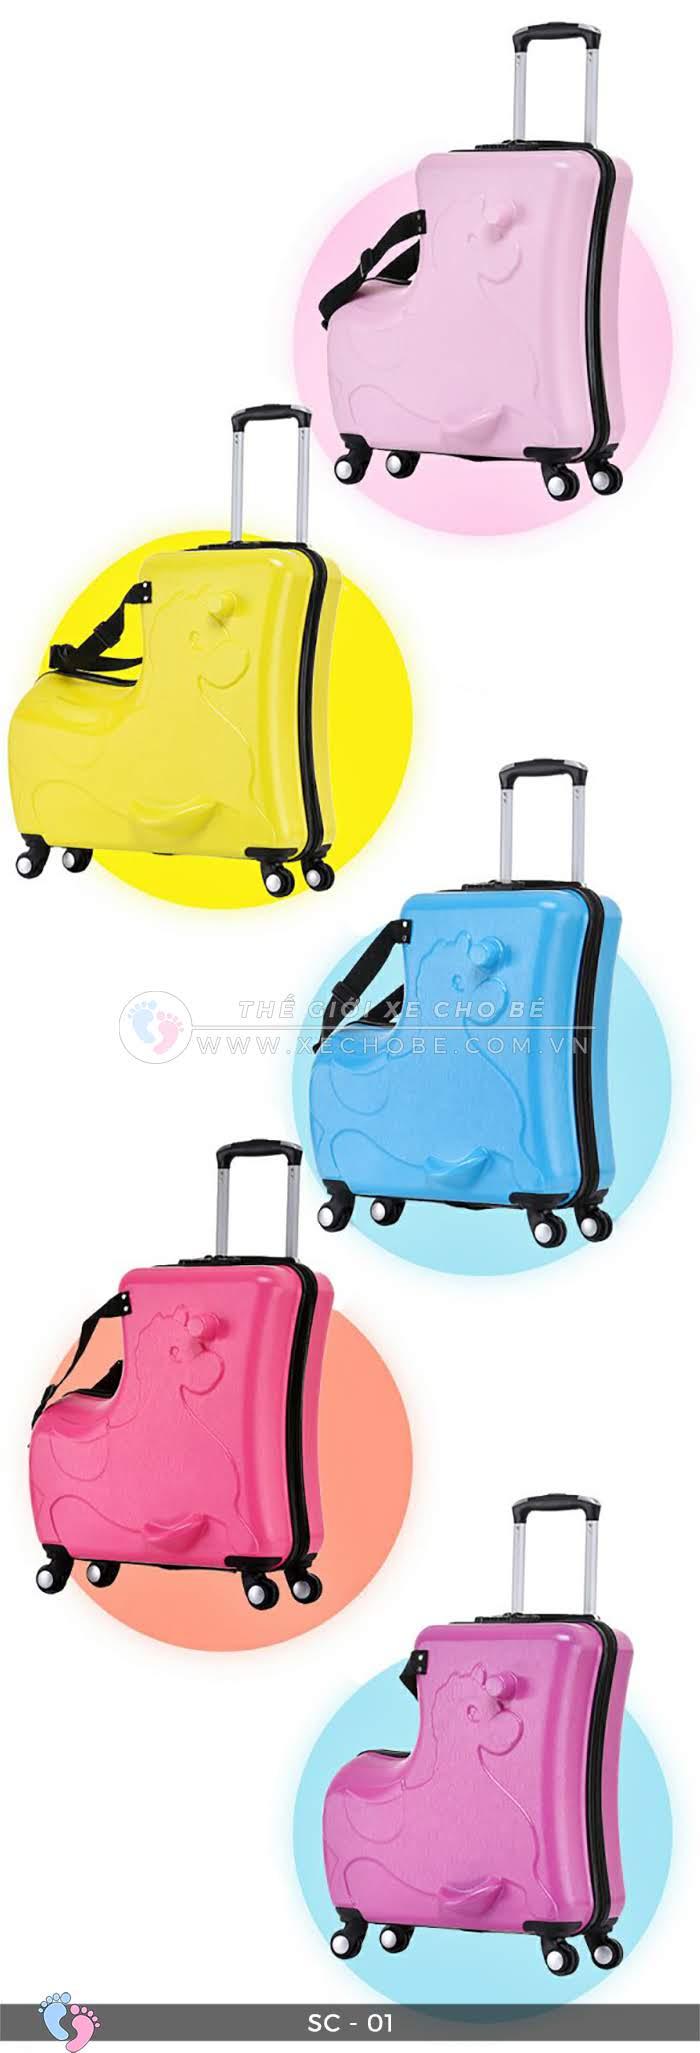 Vali du lịch cho trẻ em SC01